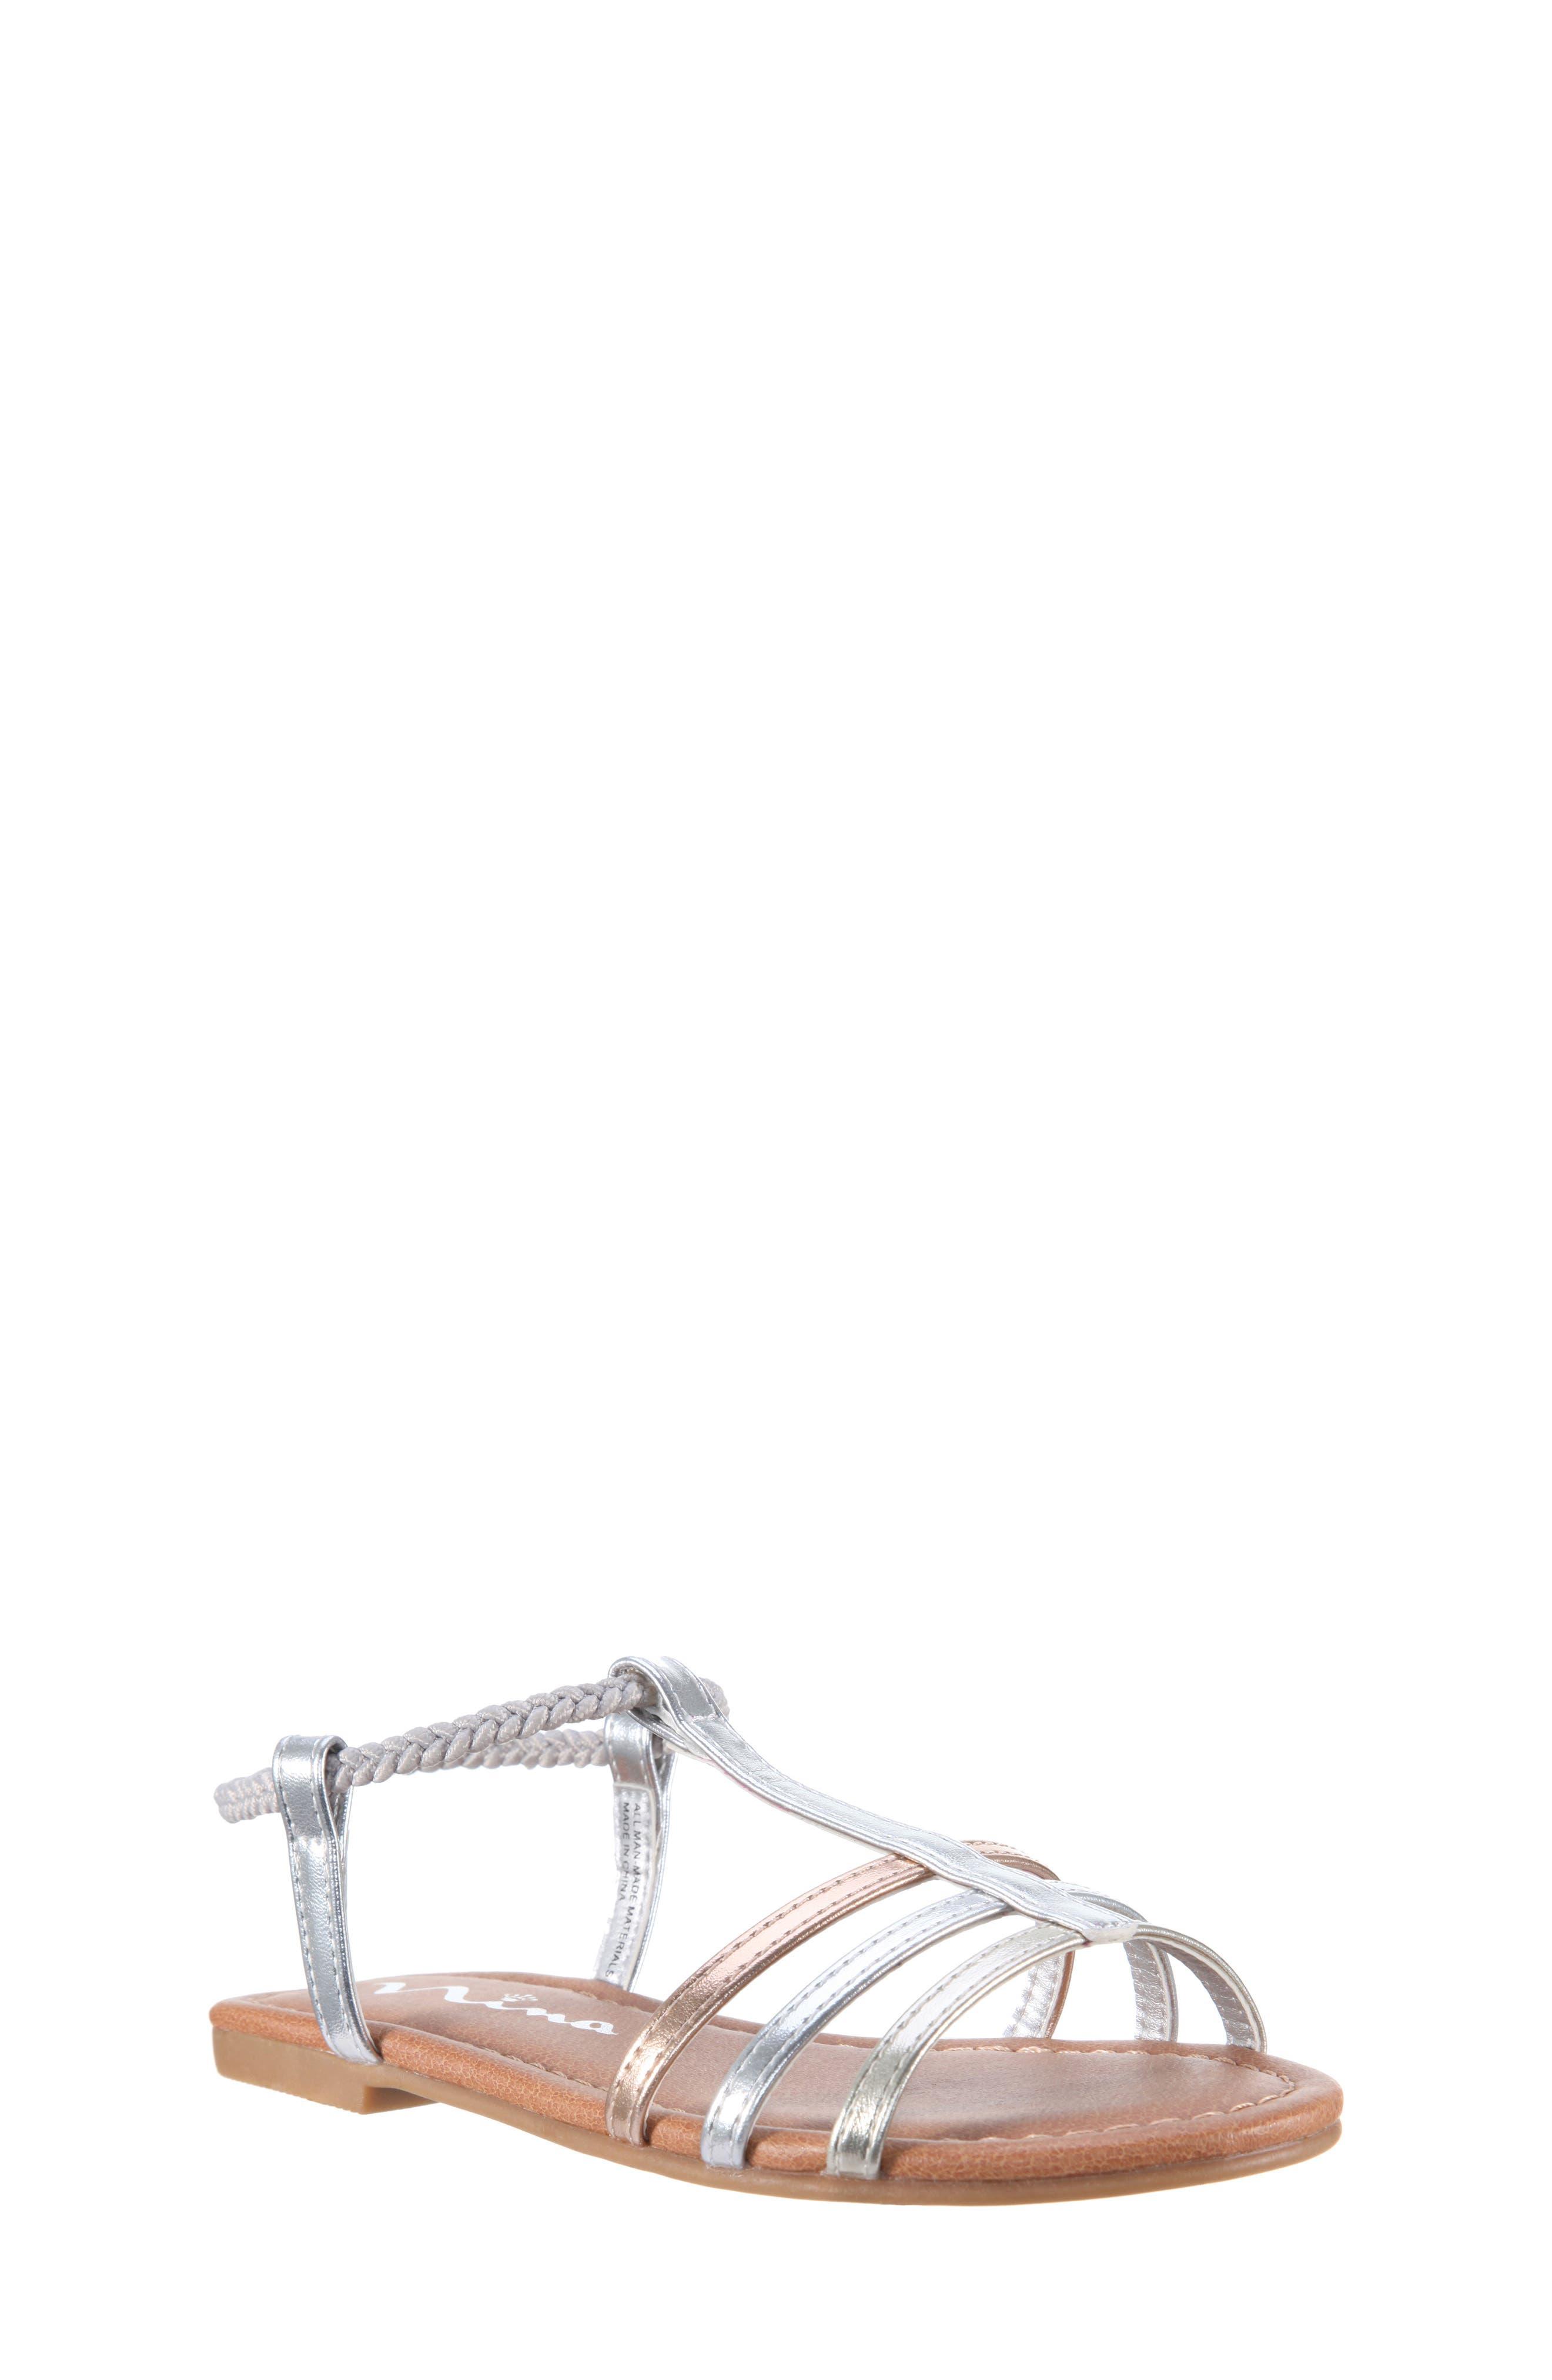 'Melvie' Sandal,                         Main,                         color, 049